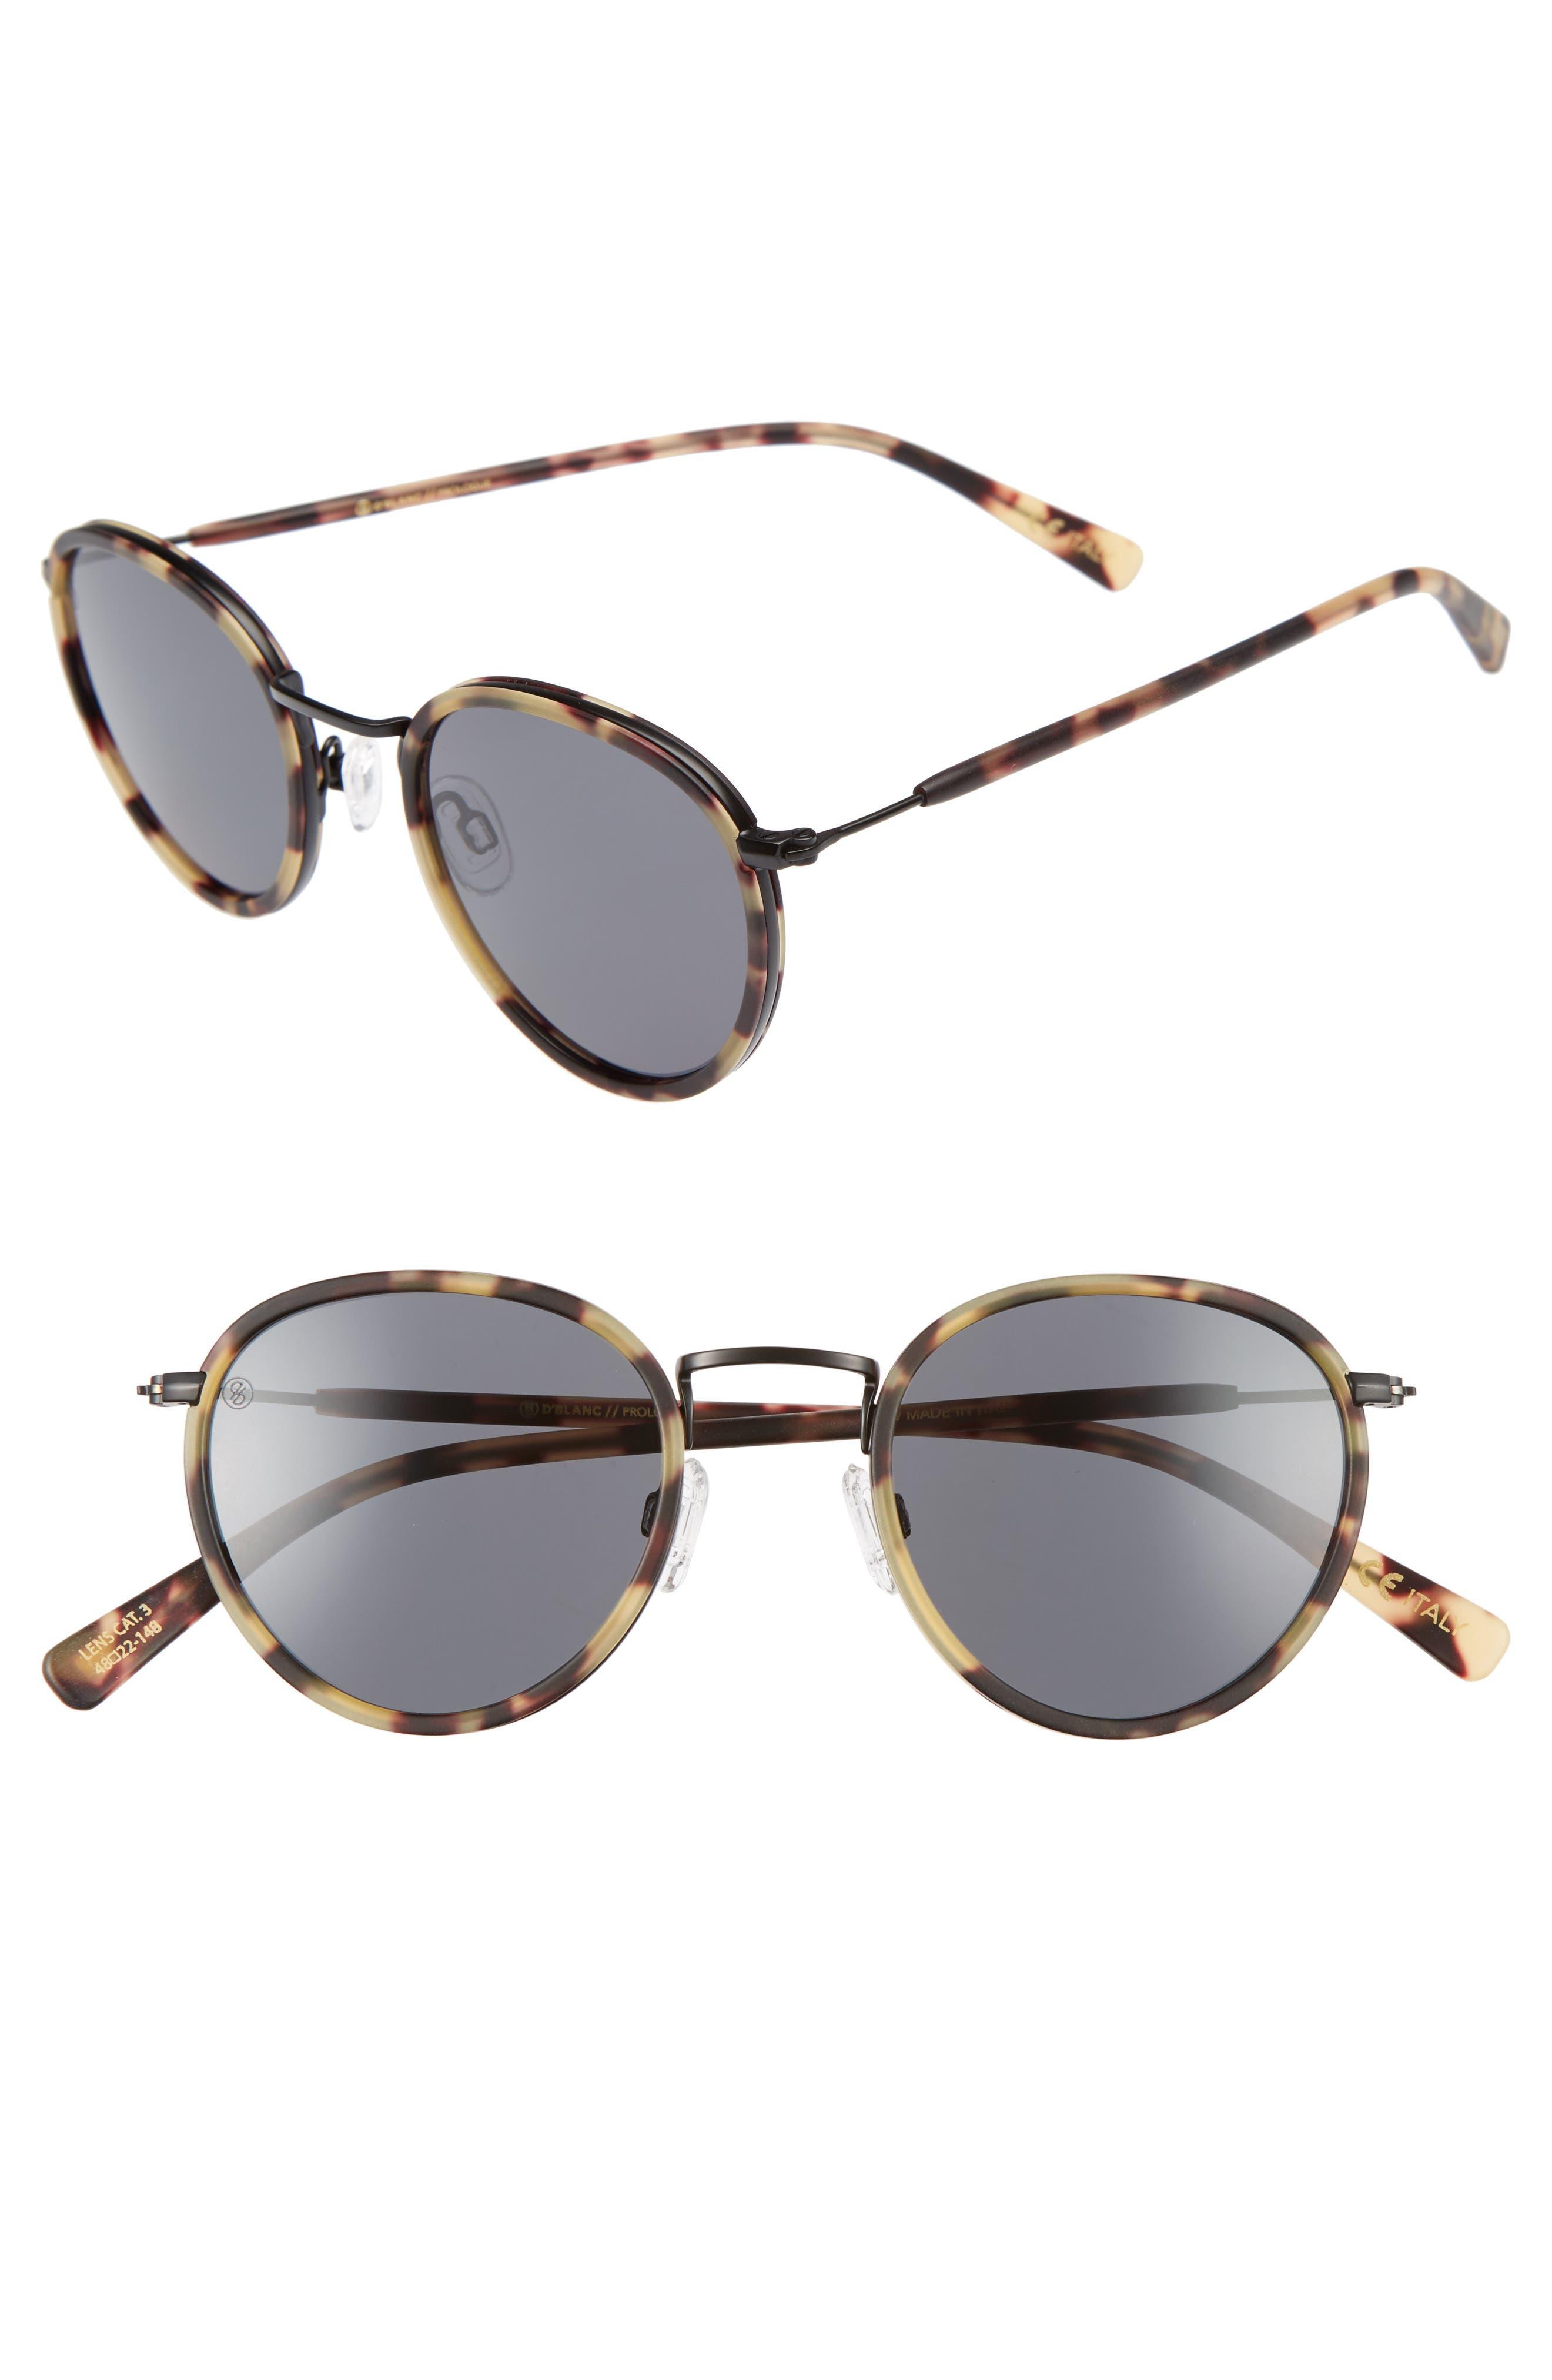 Main Image - D'BLANC Prologue 48mm Round Sunglasses